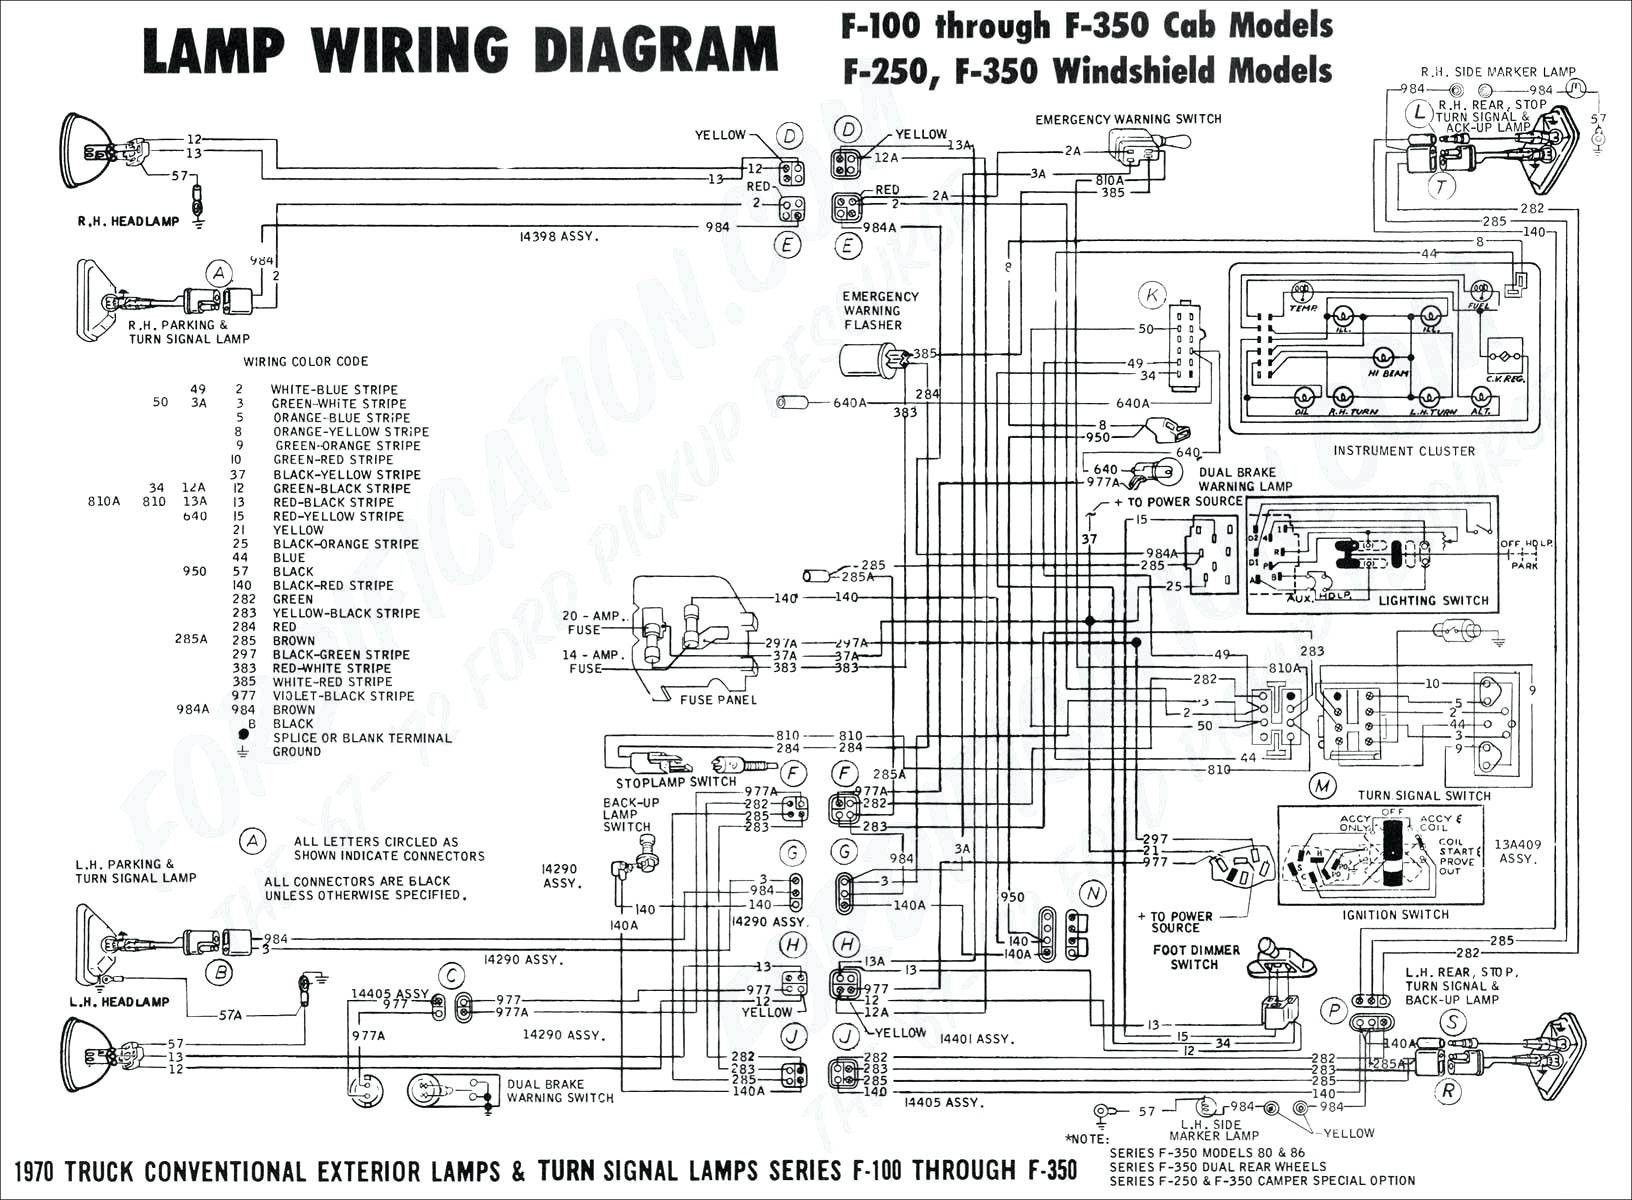 Unique Wiring Diagram Electric Gates Diagram Diagramsample Diagramtemplate Wiringdiagra Trailer Wiring Diagram Electrical Wiring Diagram Electrical Diagram